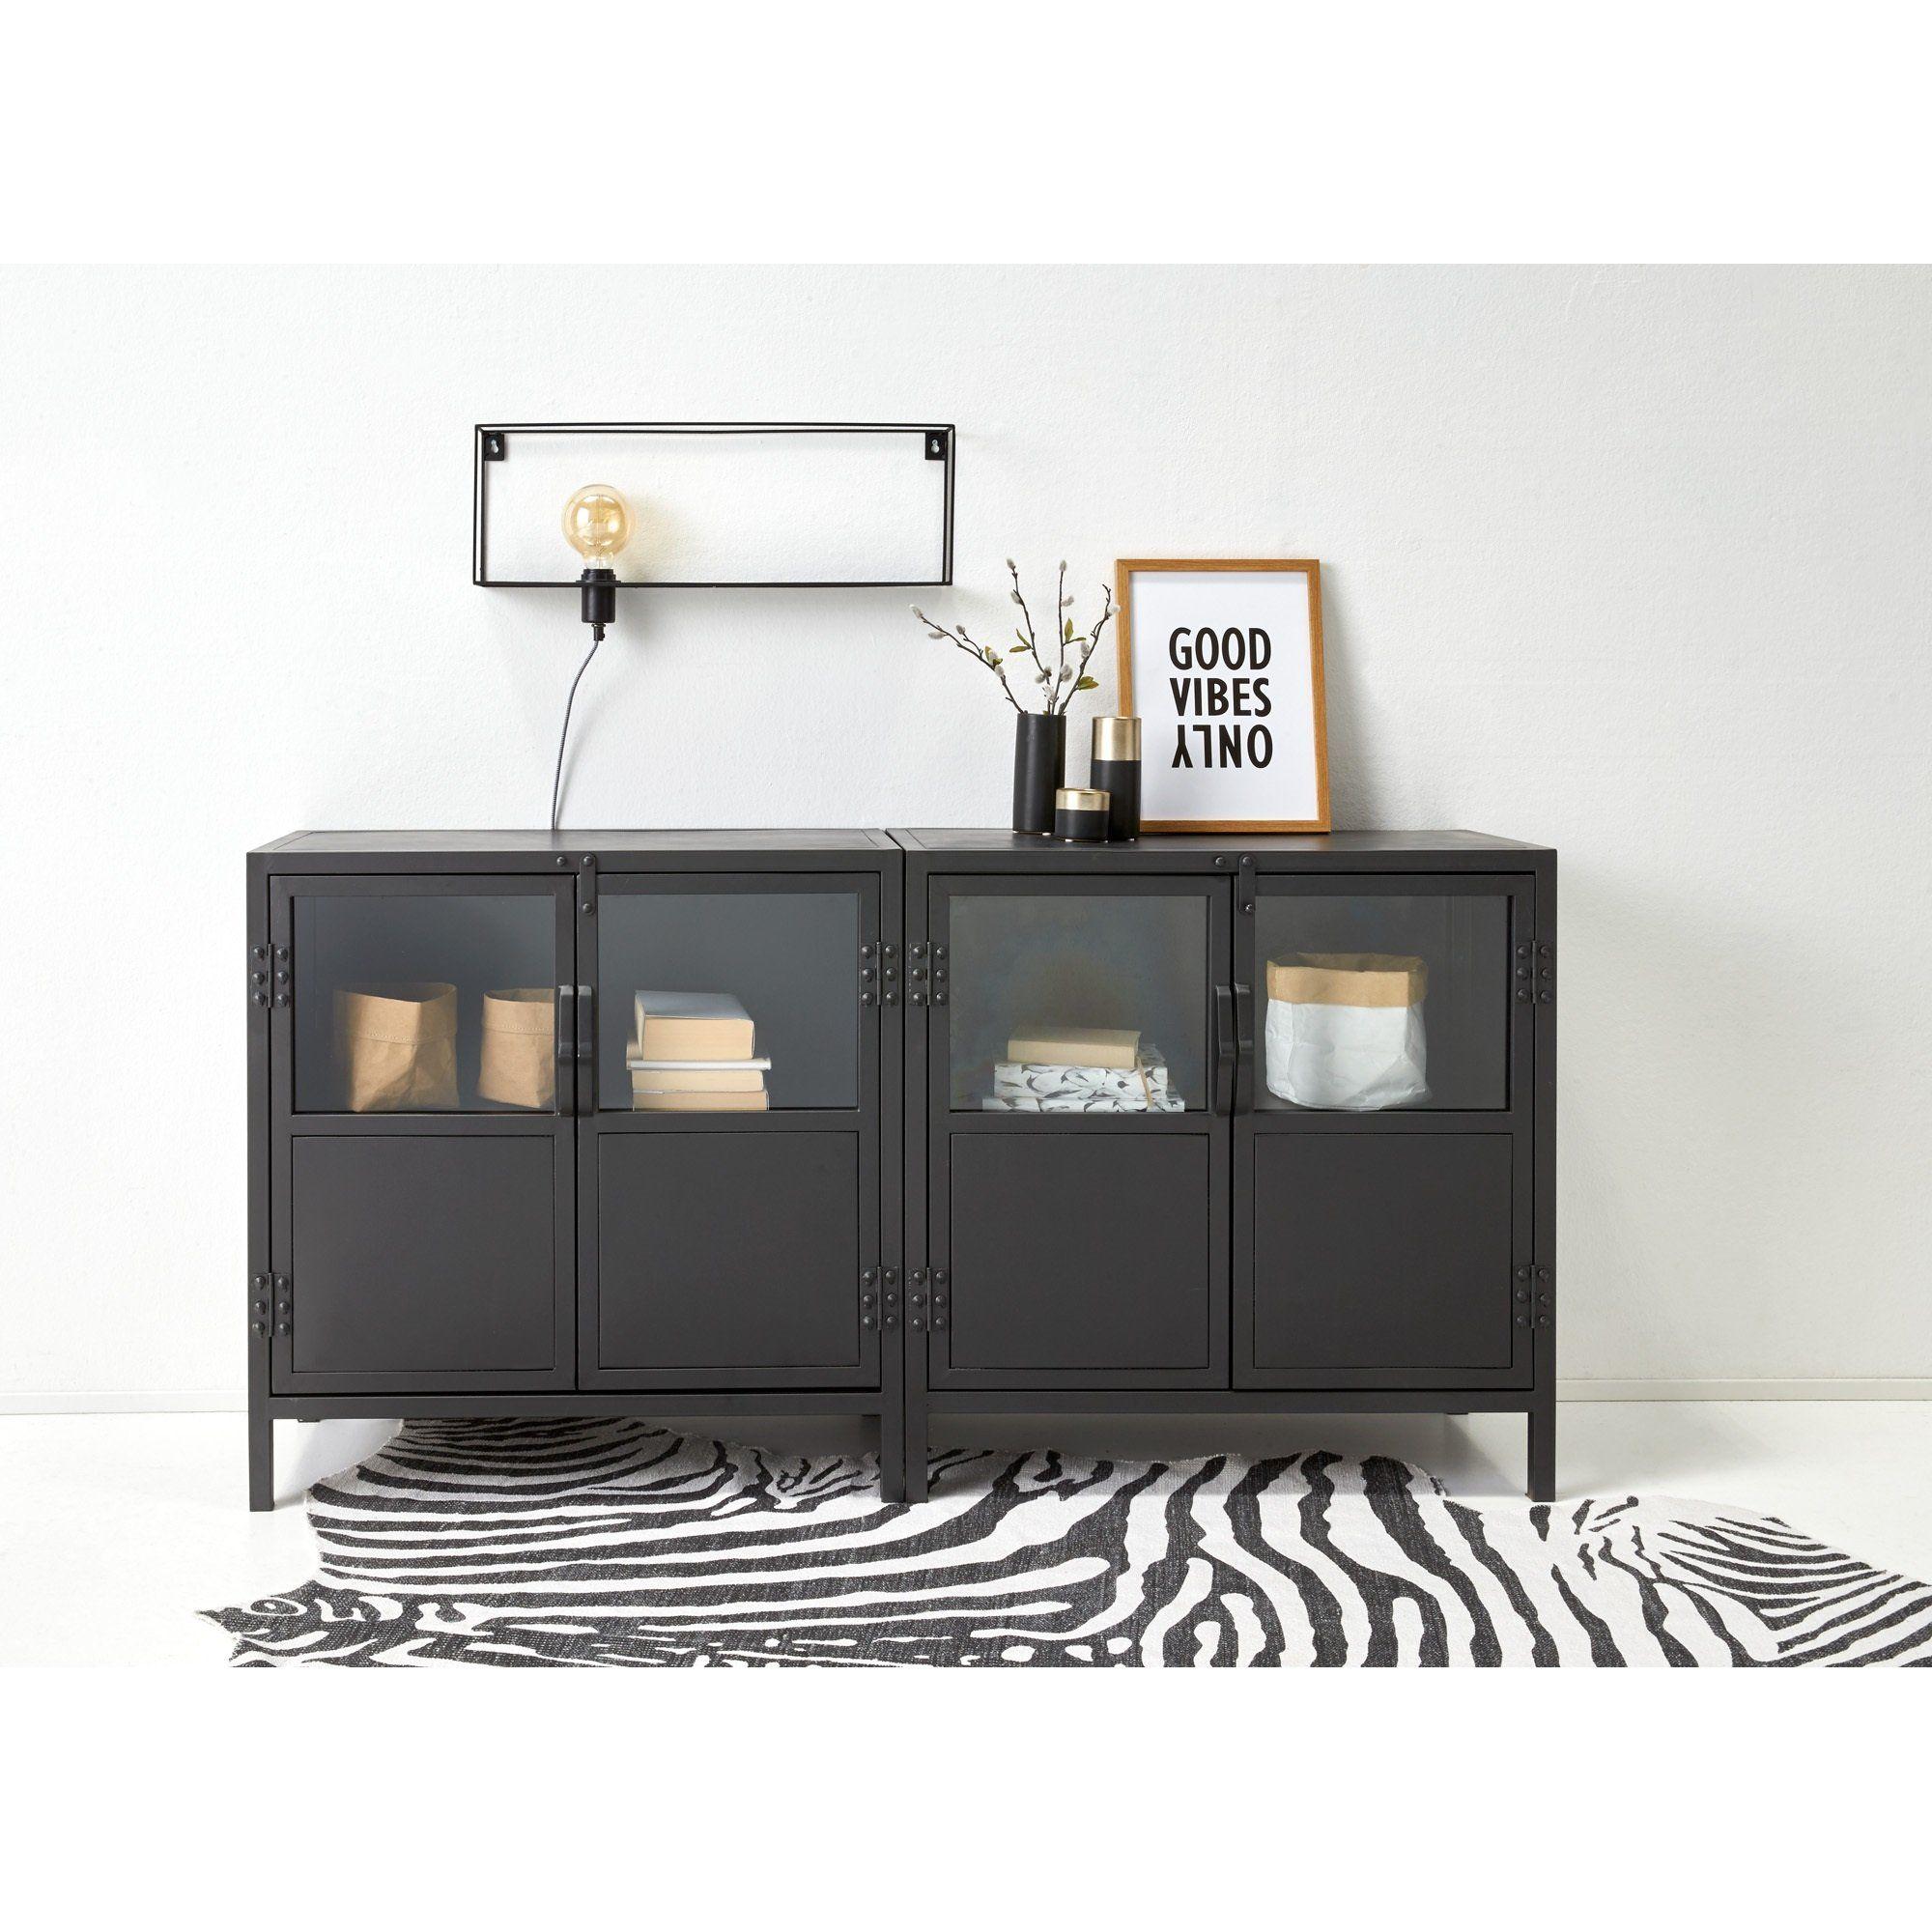 Kwantum Tv Meubel.Metalen Opbergkast Castello Kwantum Home Decor Apartment